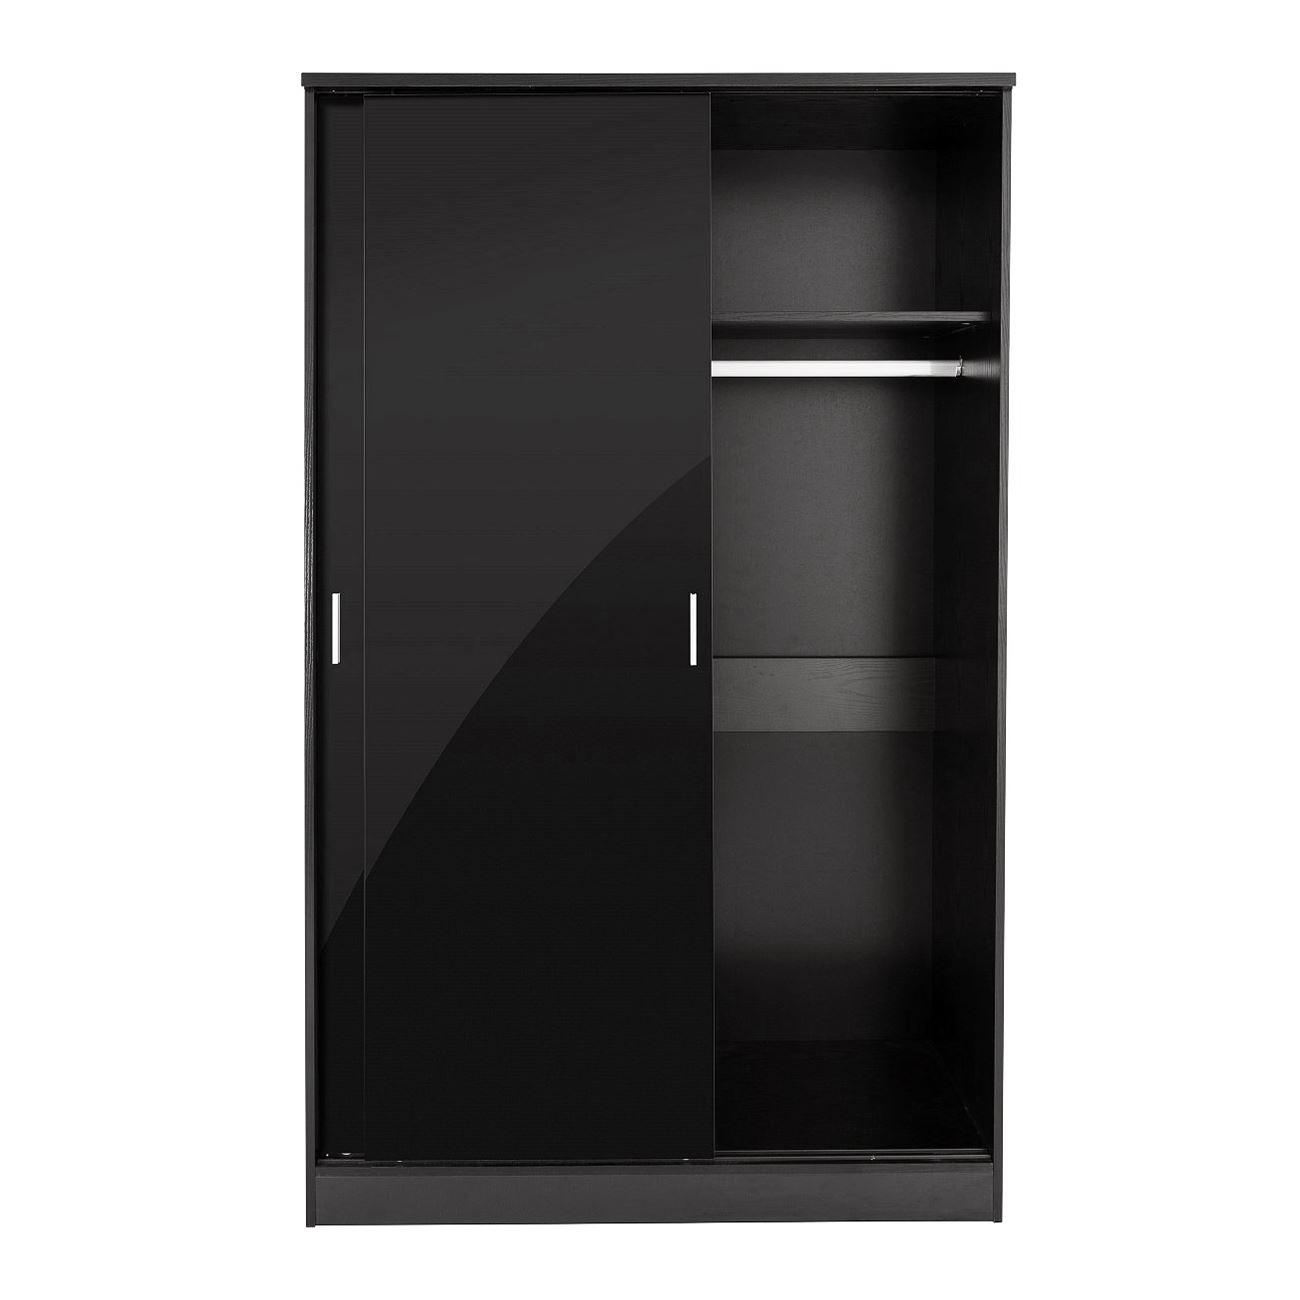 High Gloss Black Bedroom Furniture Lynx High Gloss Black Bedroom Furniture Best Bedroom Ideas 2017